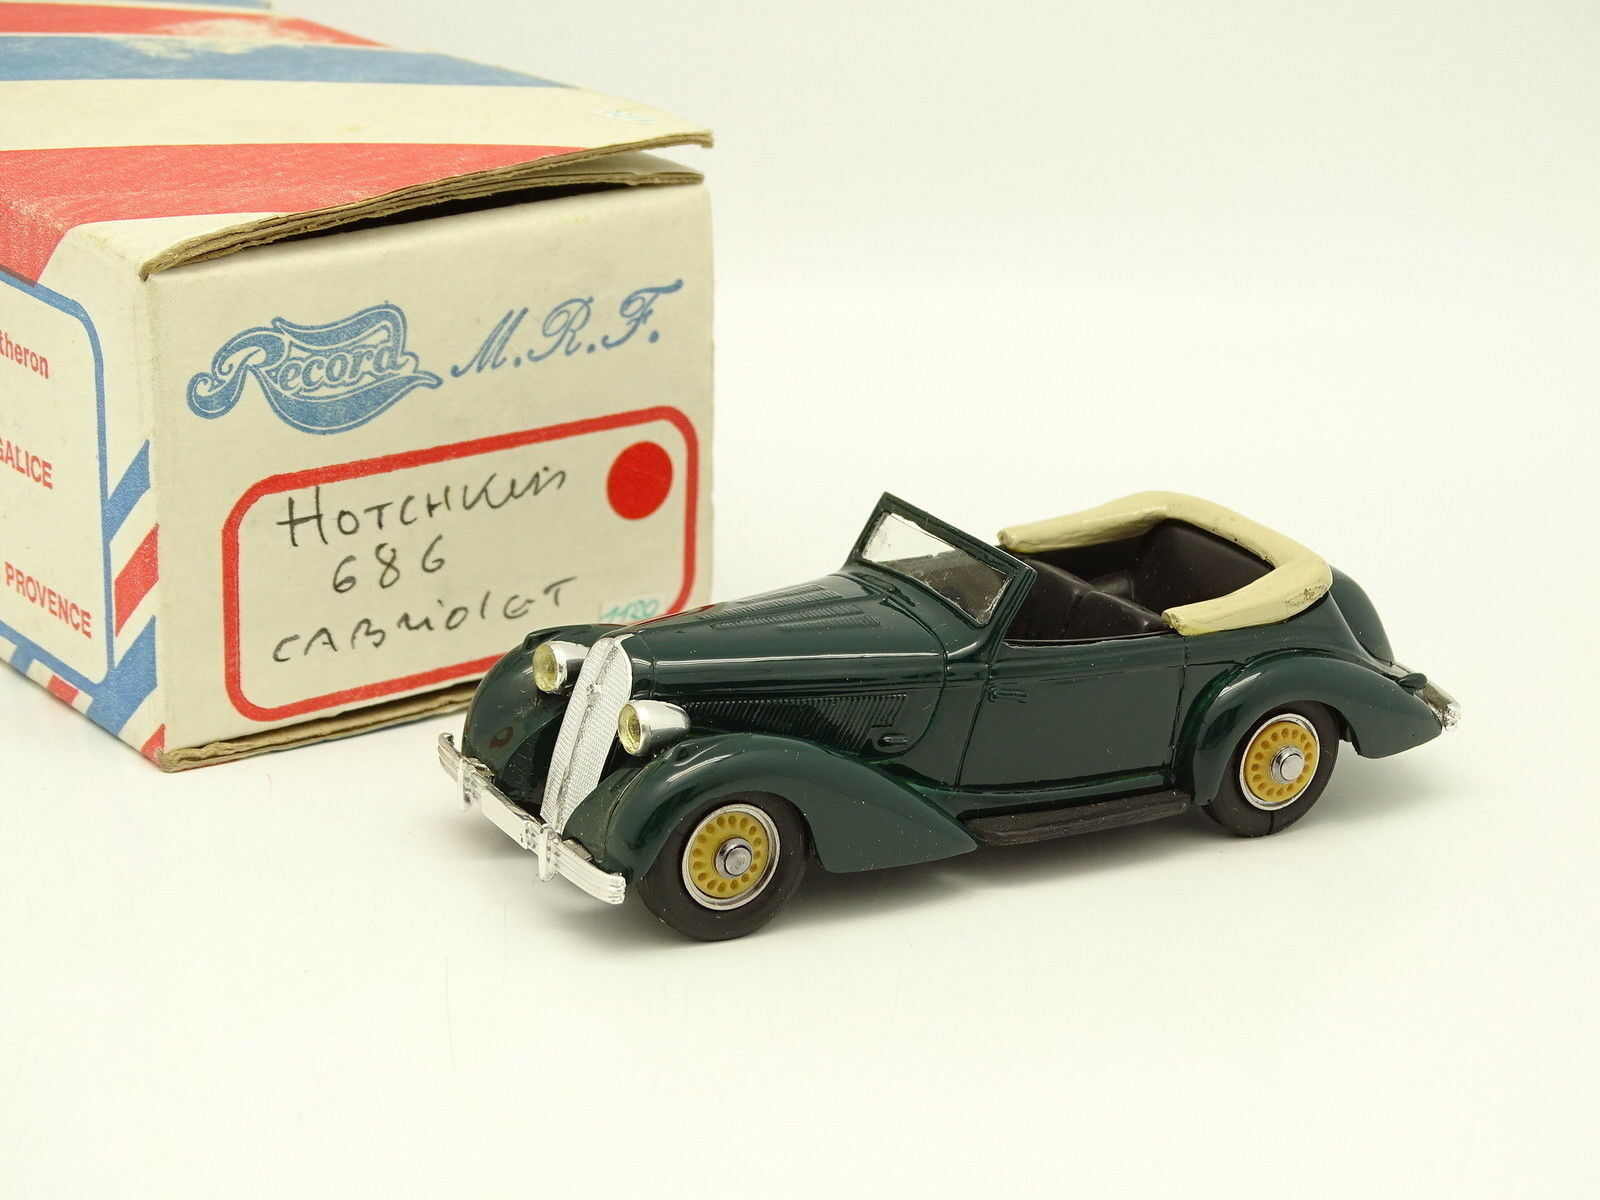 Record Kit Montado 1 43 - Hotchkiss 686 Cabriolet green